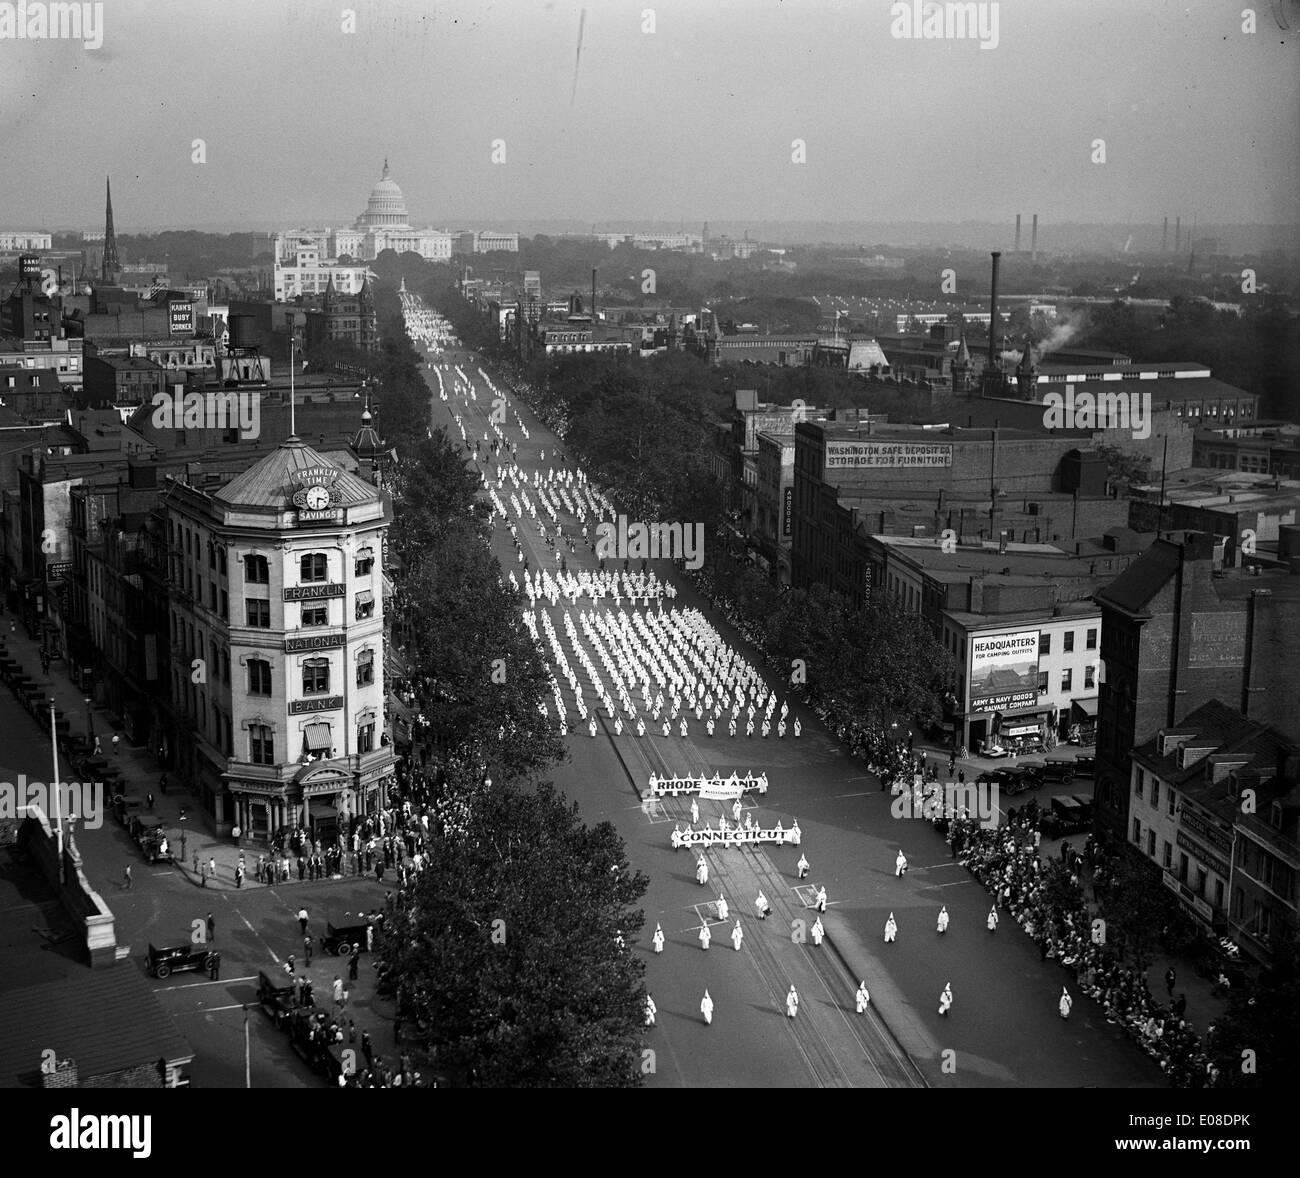 Ku Klux Klan march on Pennsylvania Avenue, Washington, D.C. - Stock Image